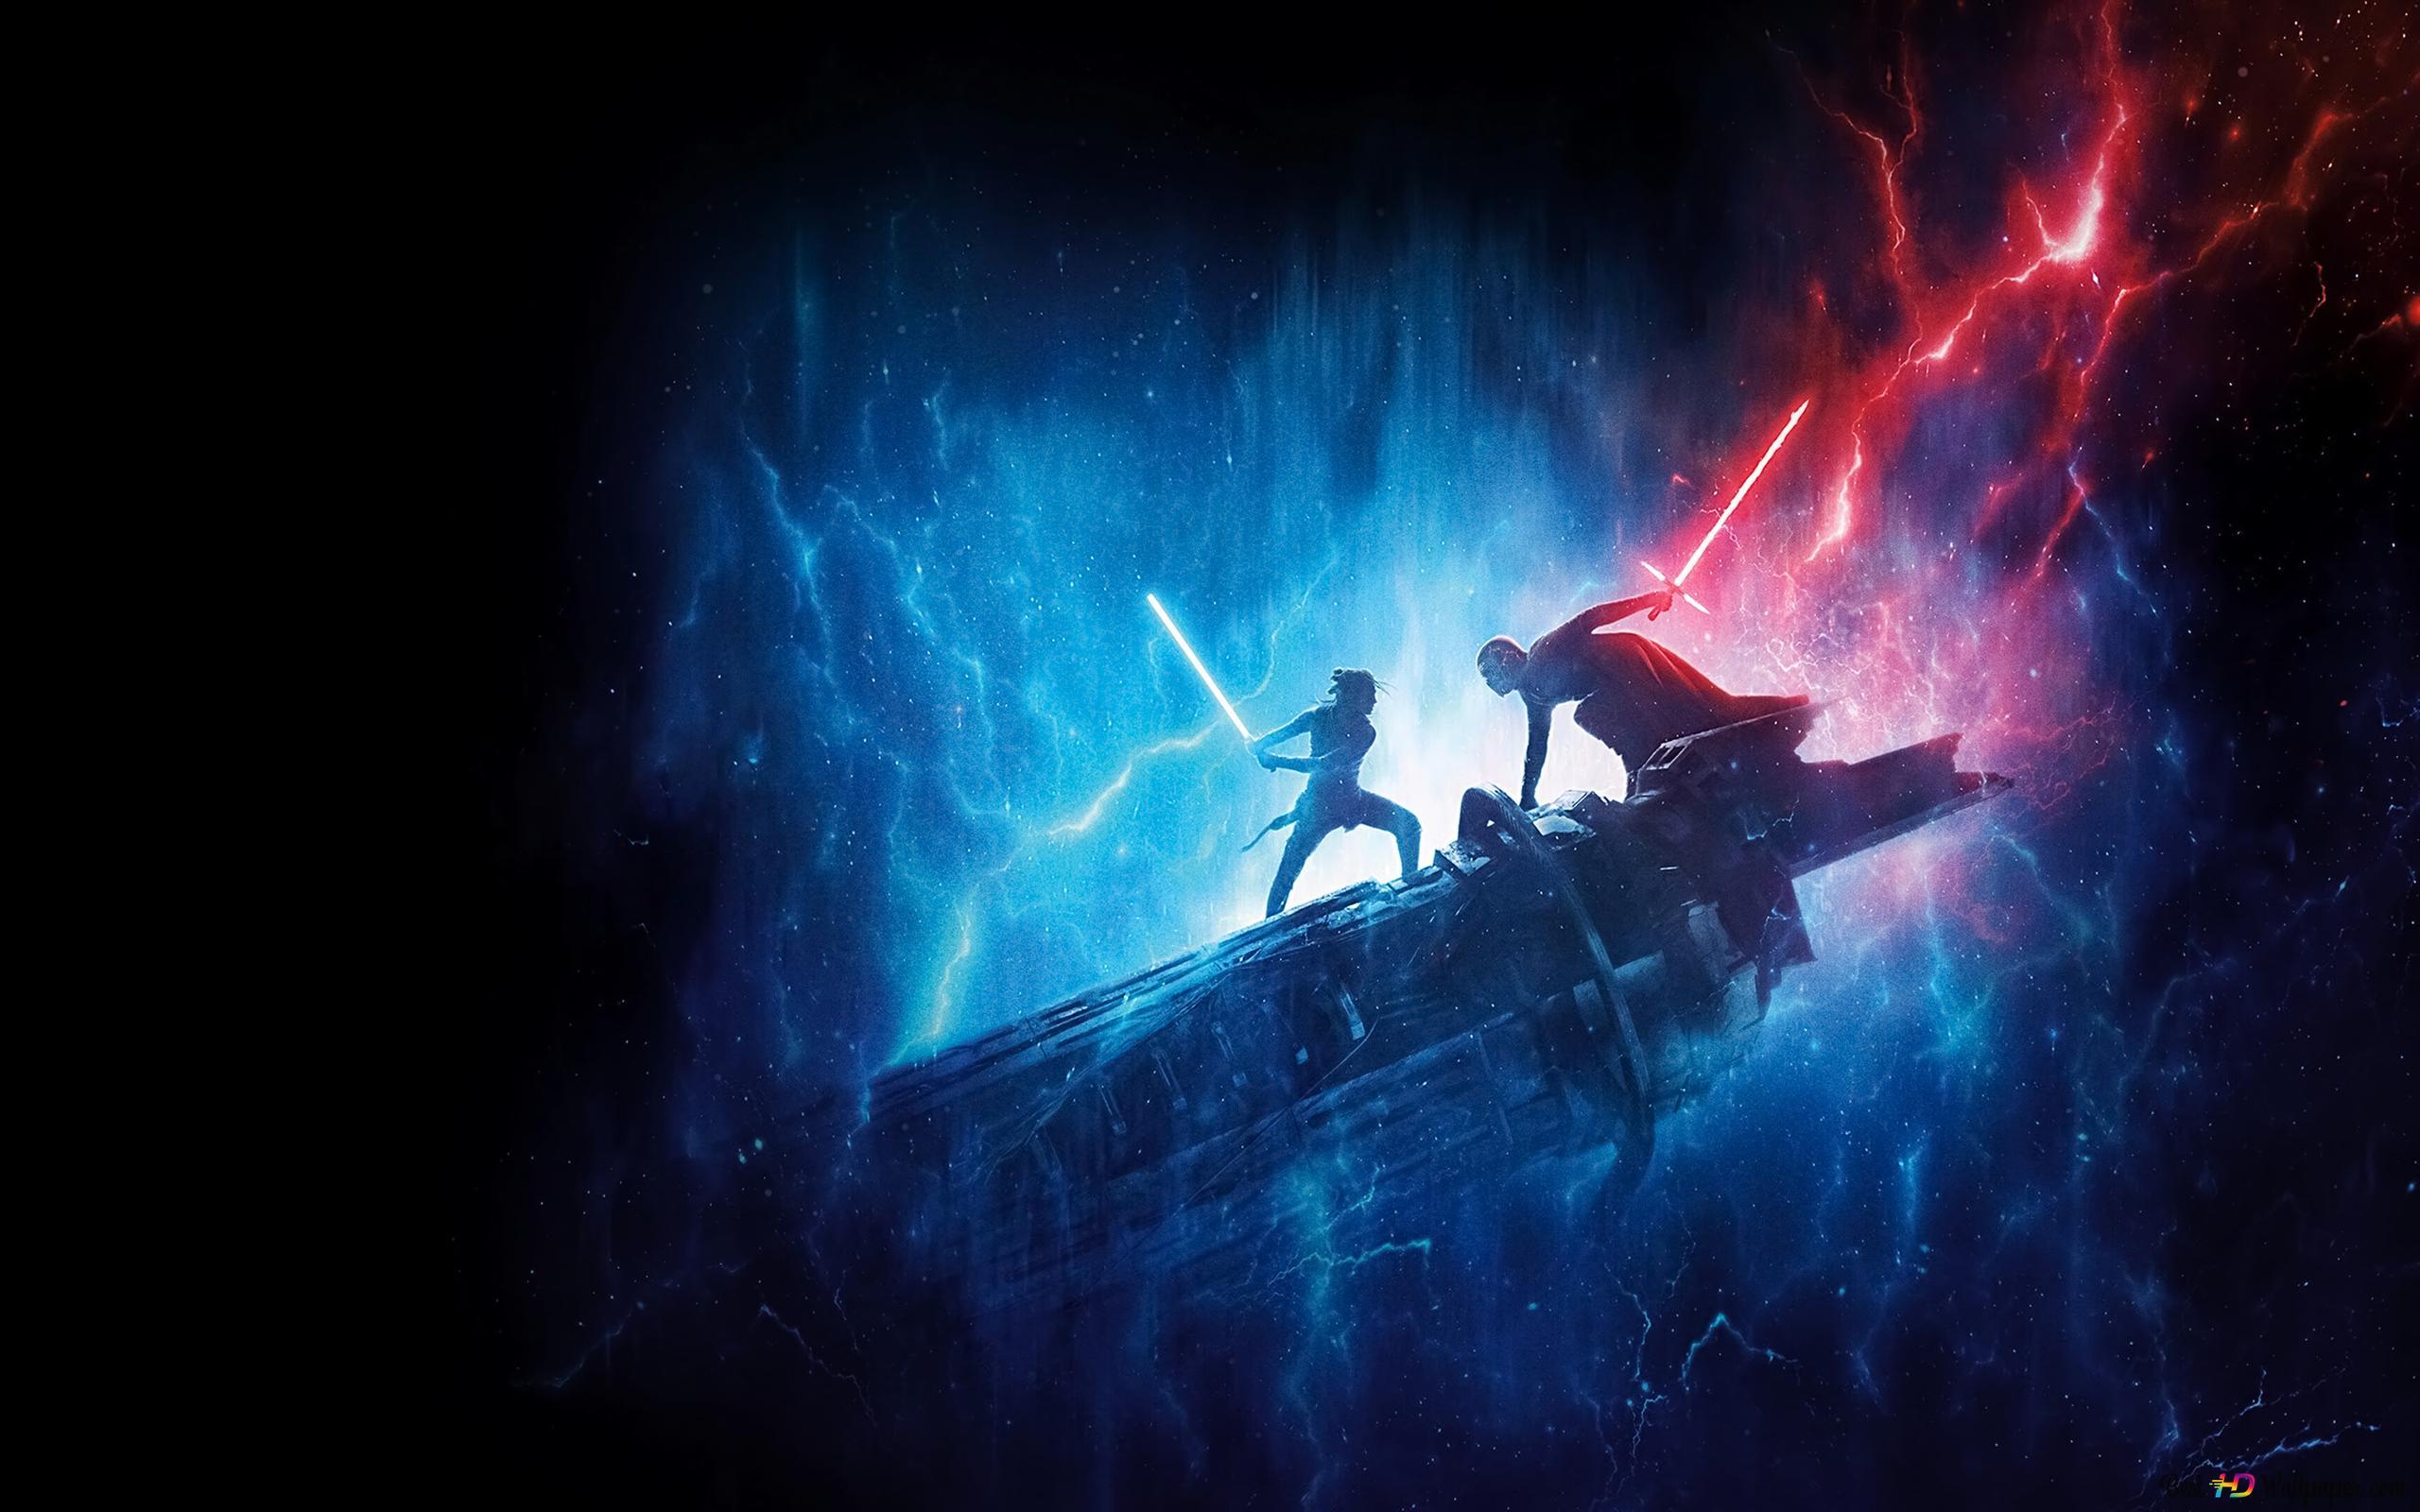 star wars rey s blue lightsaber vs kylo ren s red lightsaber wallpaper 2560x1600 42018 7